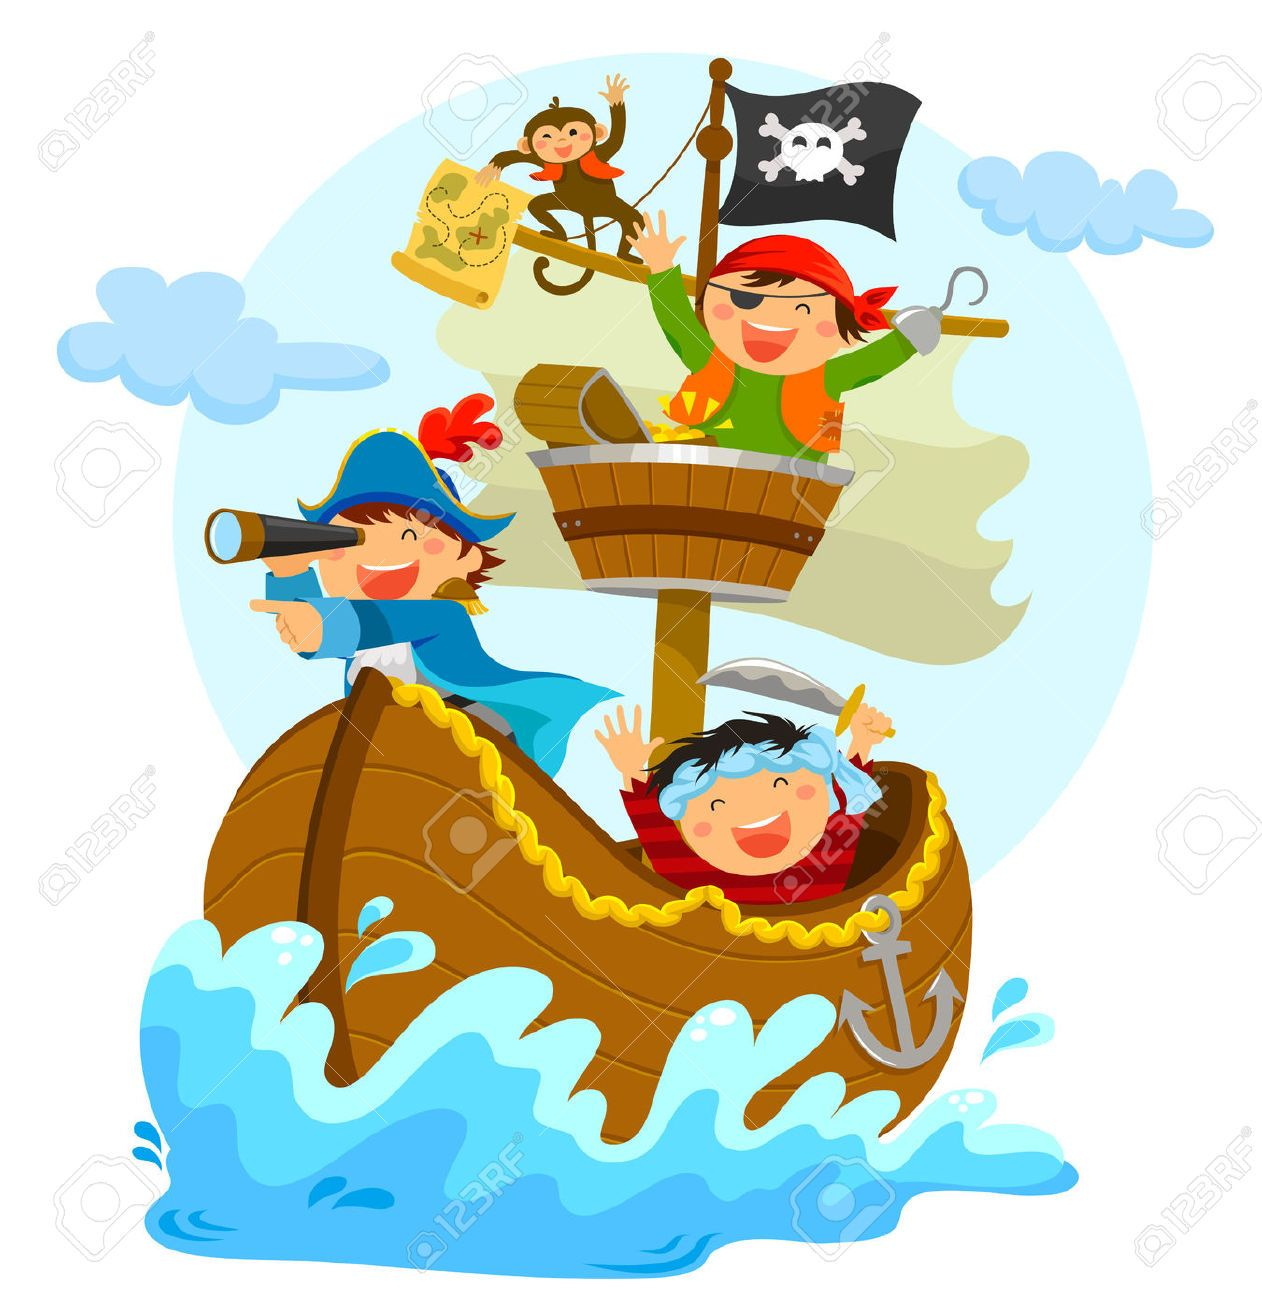 Barco pirata dibujo animado recherche google - Imagenes de barcos infantiles ...